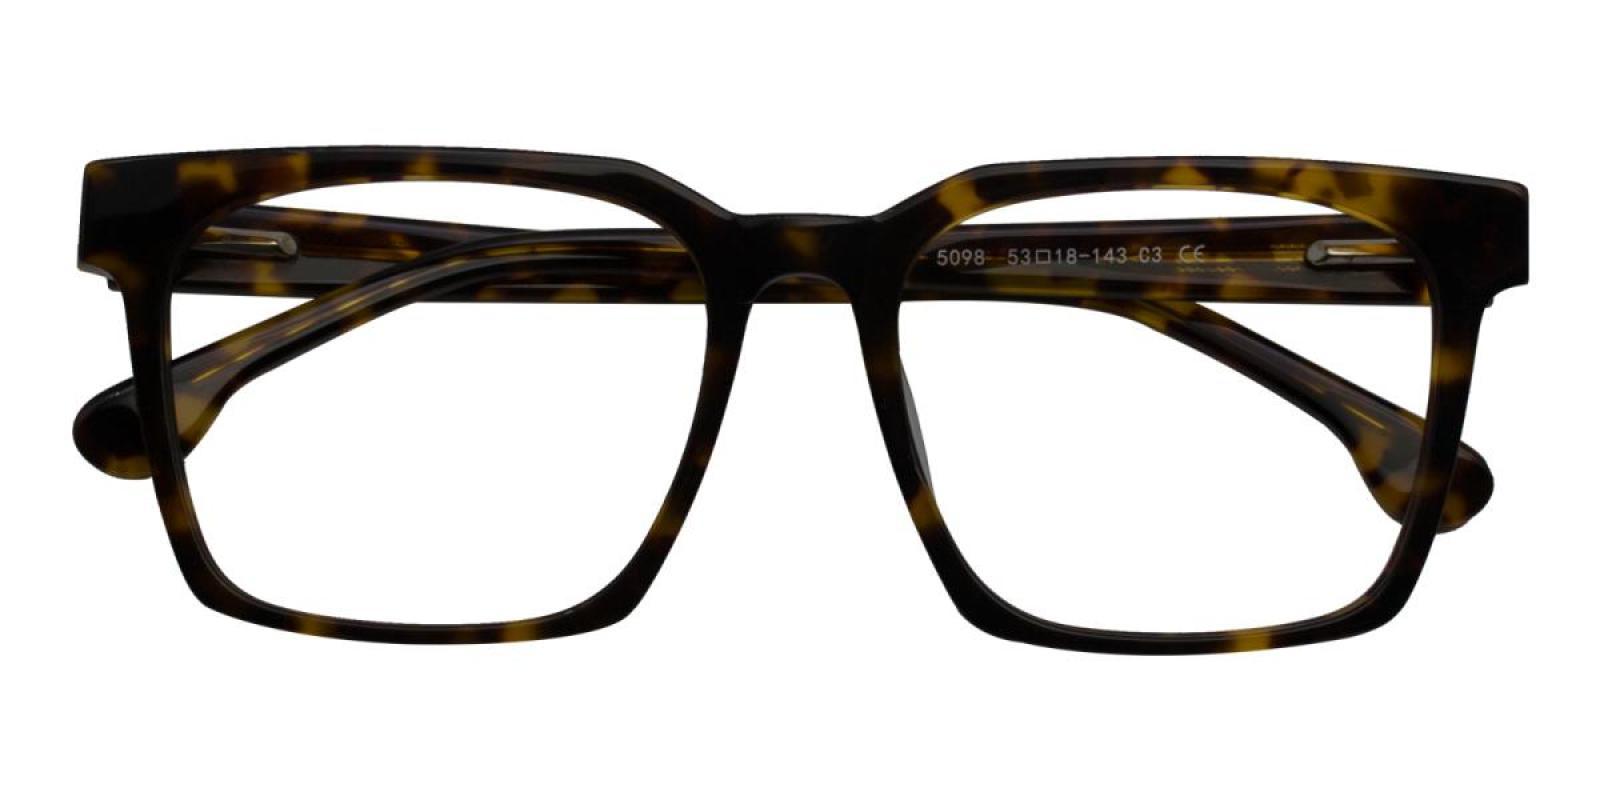 Trapezoid-Tortoise-Square-Acetate-Eyeglasses-detail